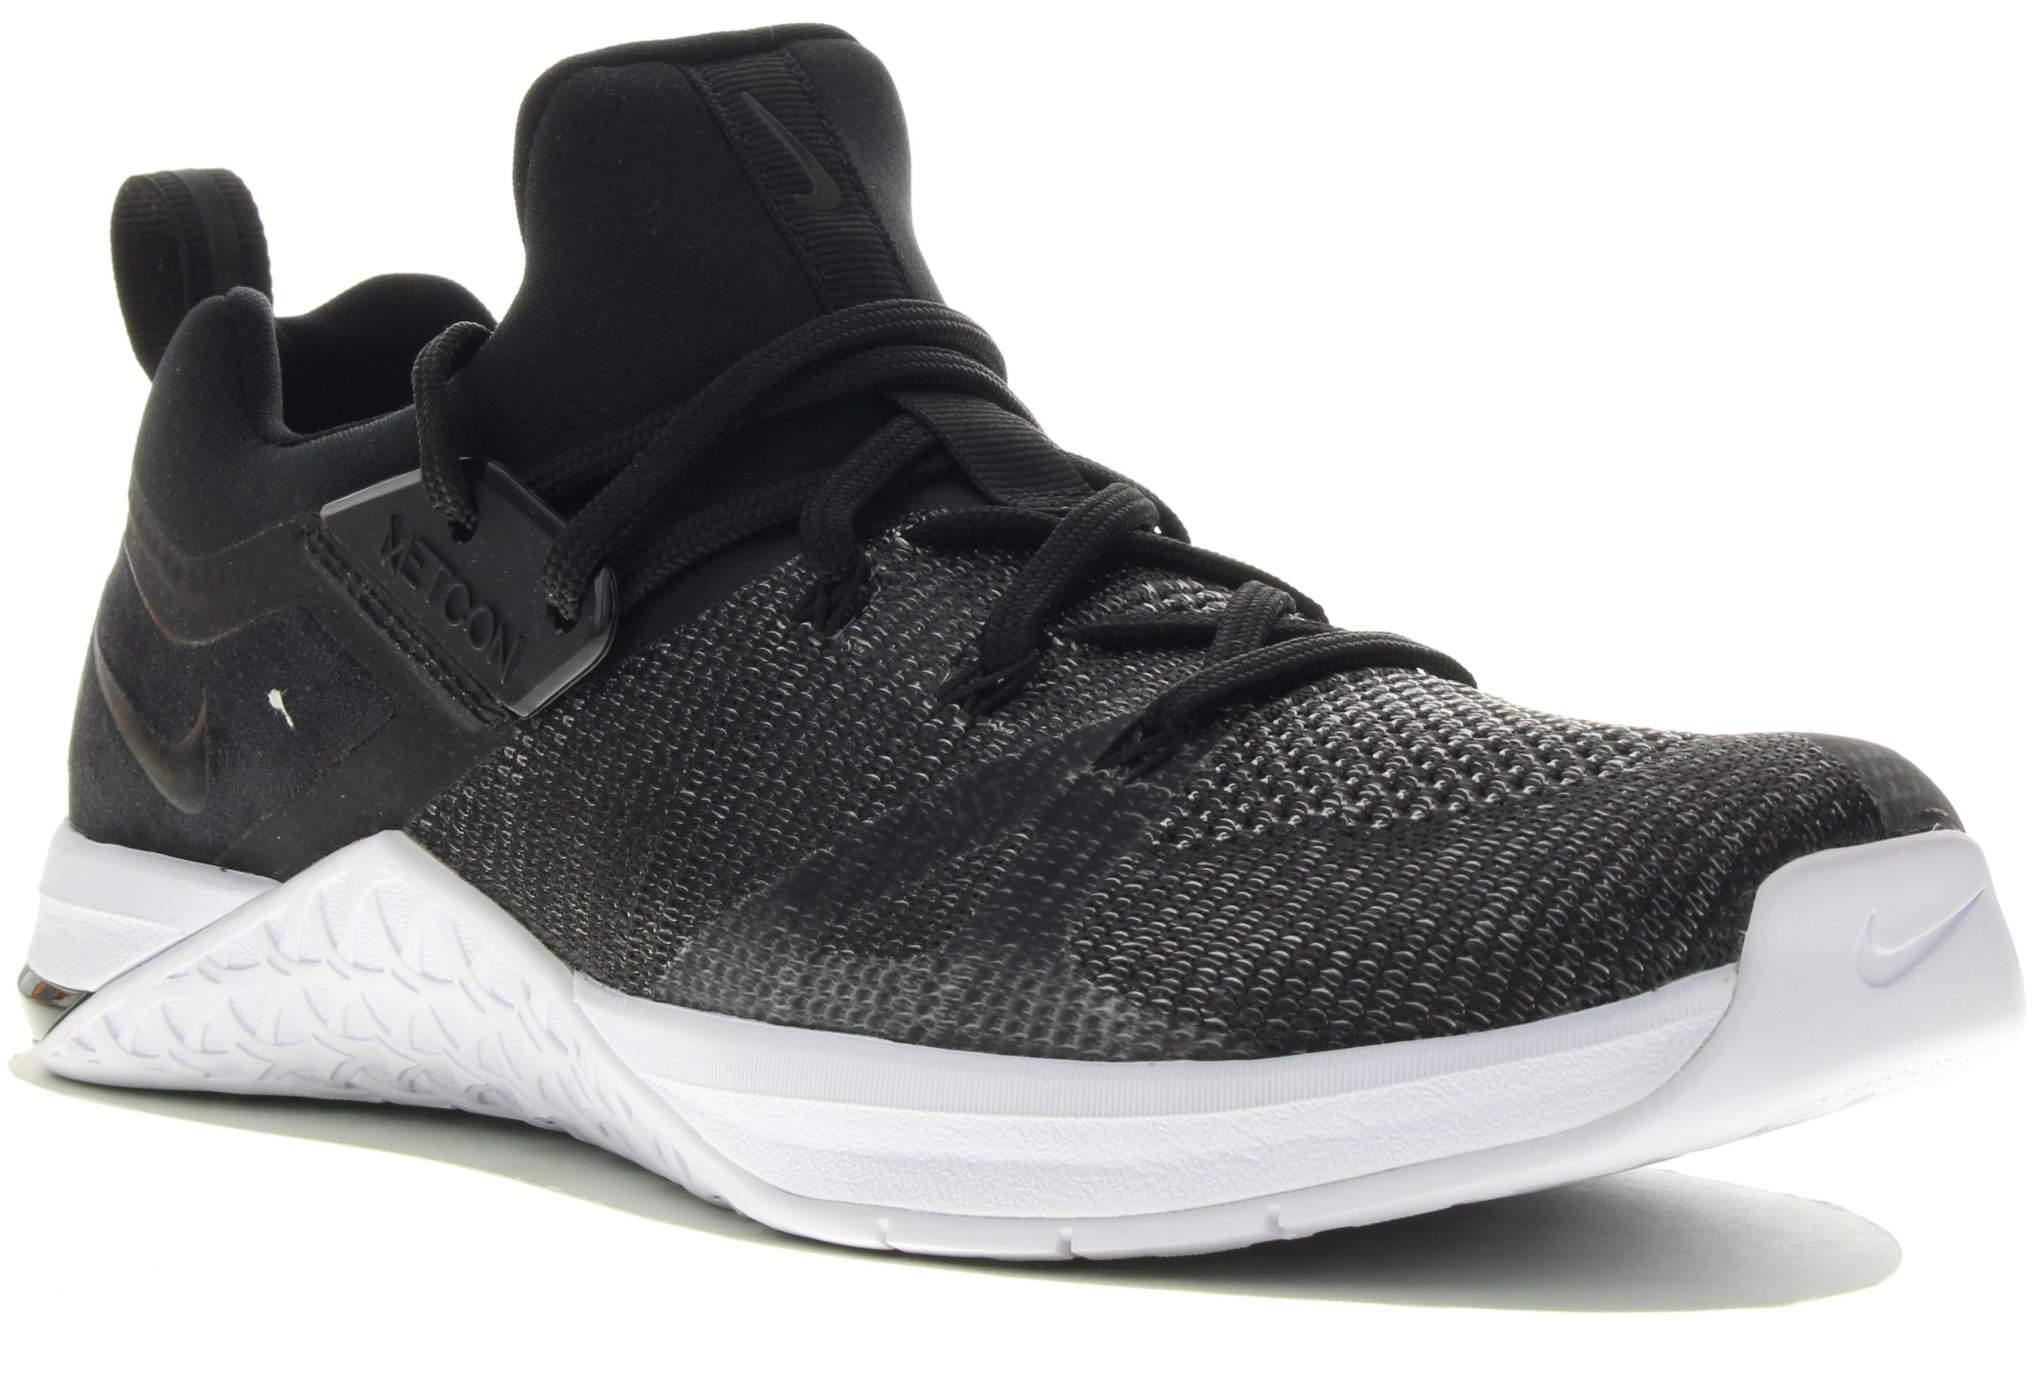 Nike Metcon Flyknit 3 W Diététique Chaussures femme